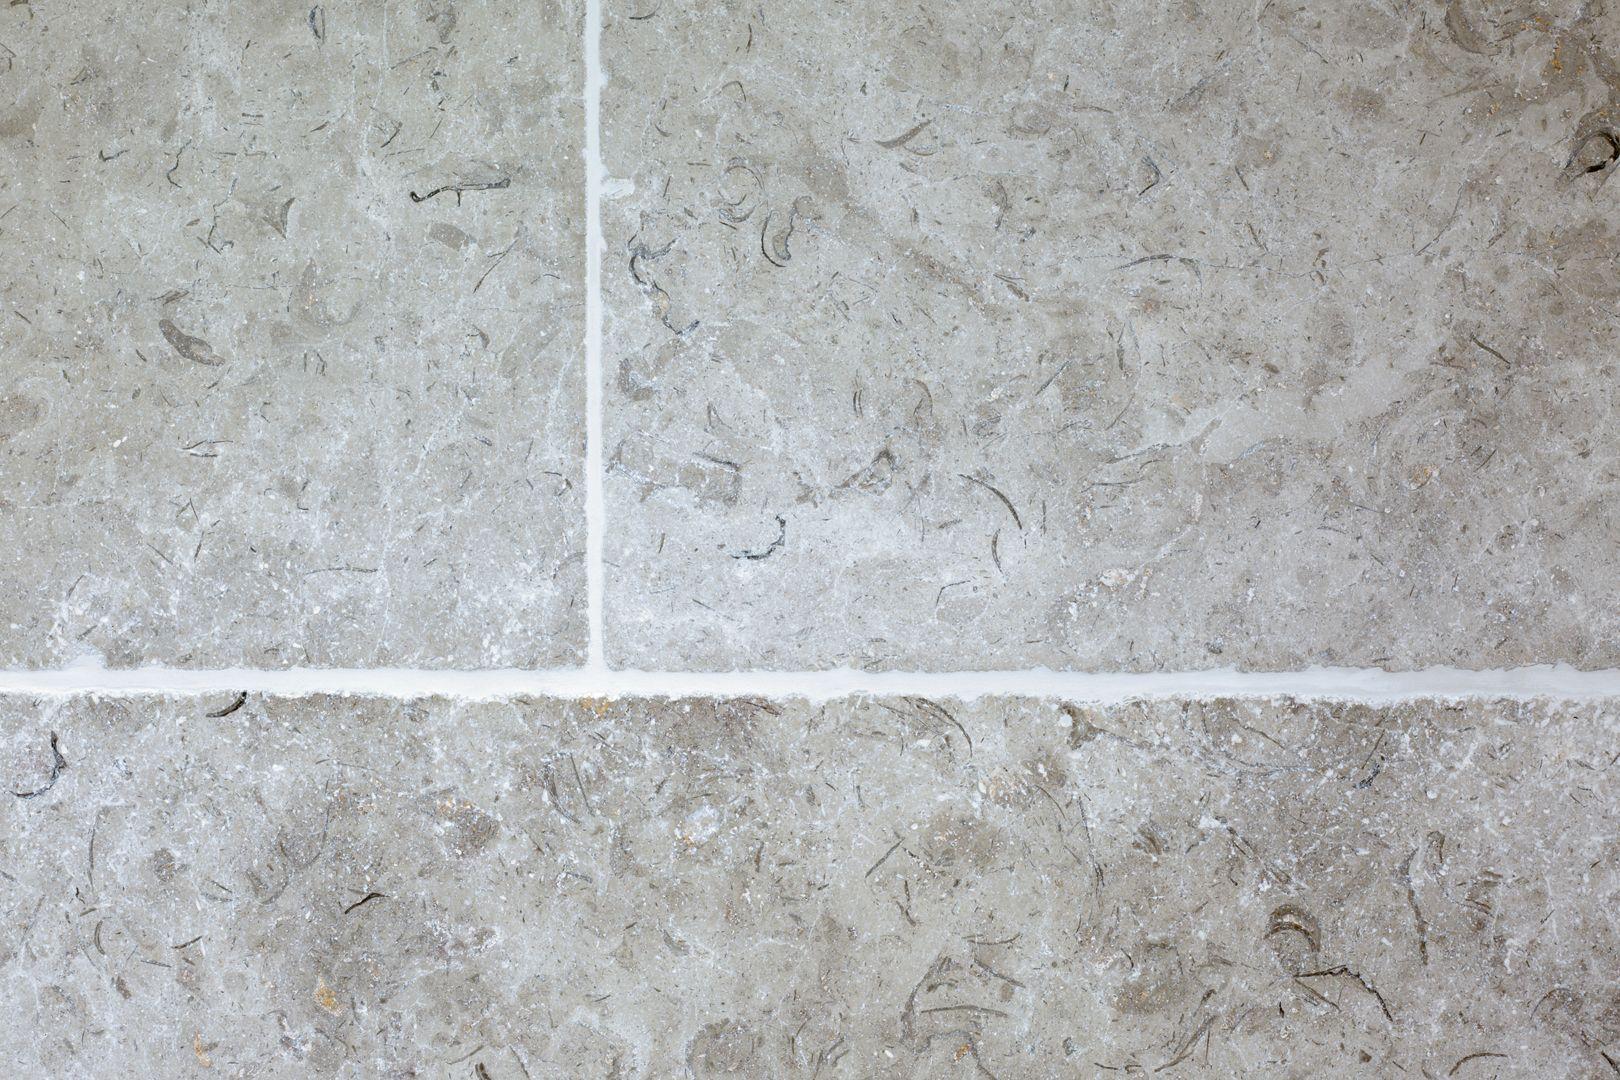 Regency grey tumbled limestone floor tiles mystonefloor regency grey tumbled limestone floor tiles mystonefloor doublecrazyfo Image collections